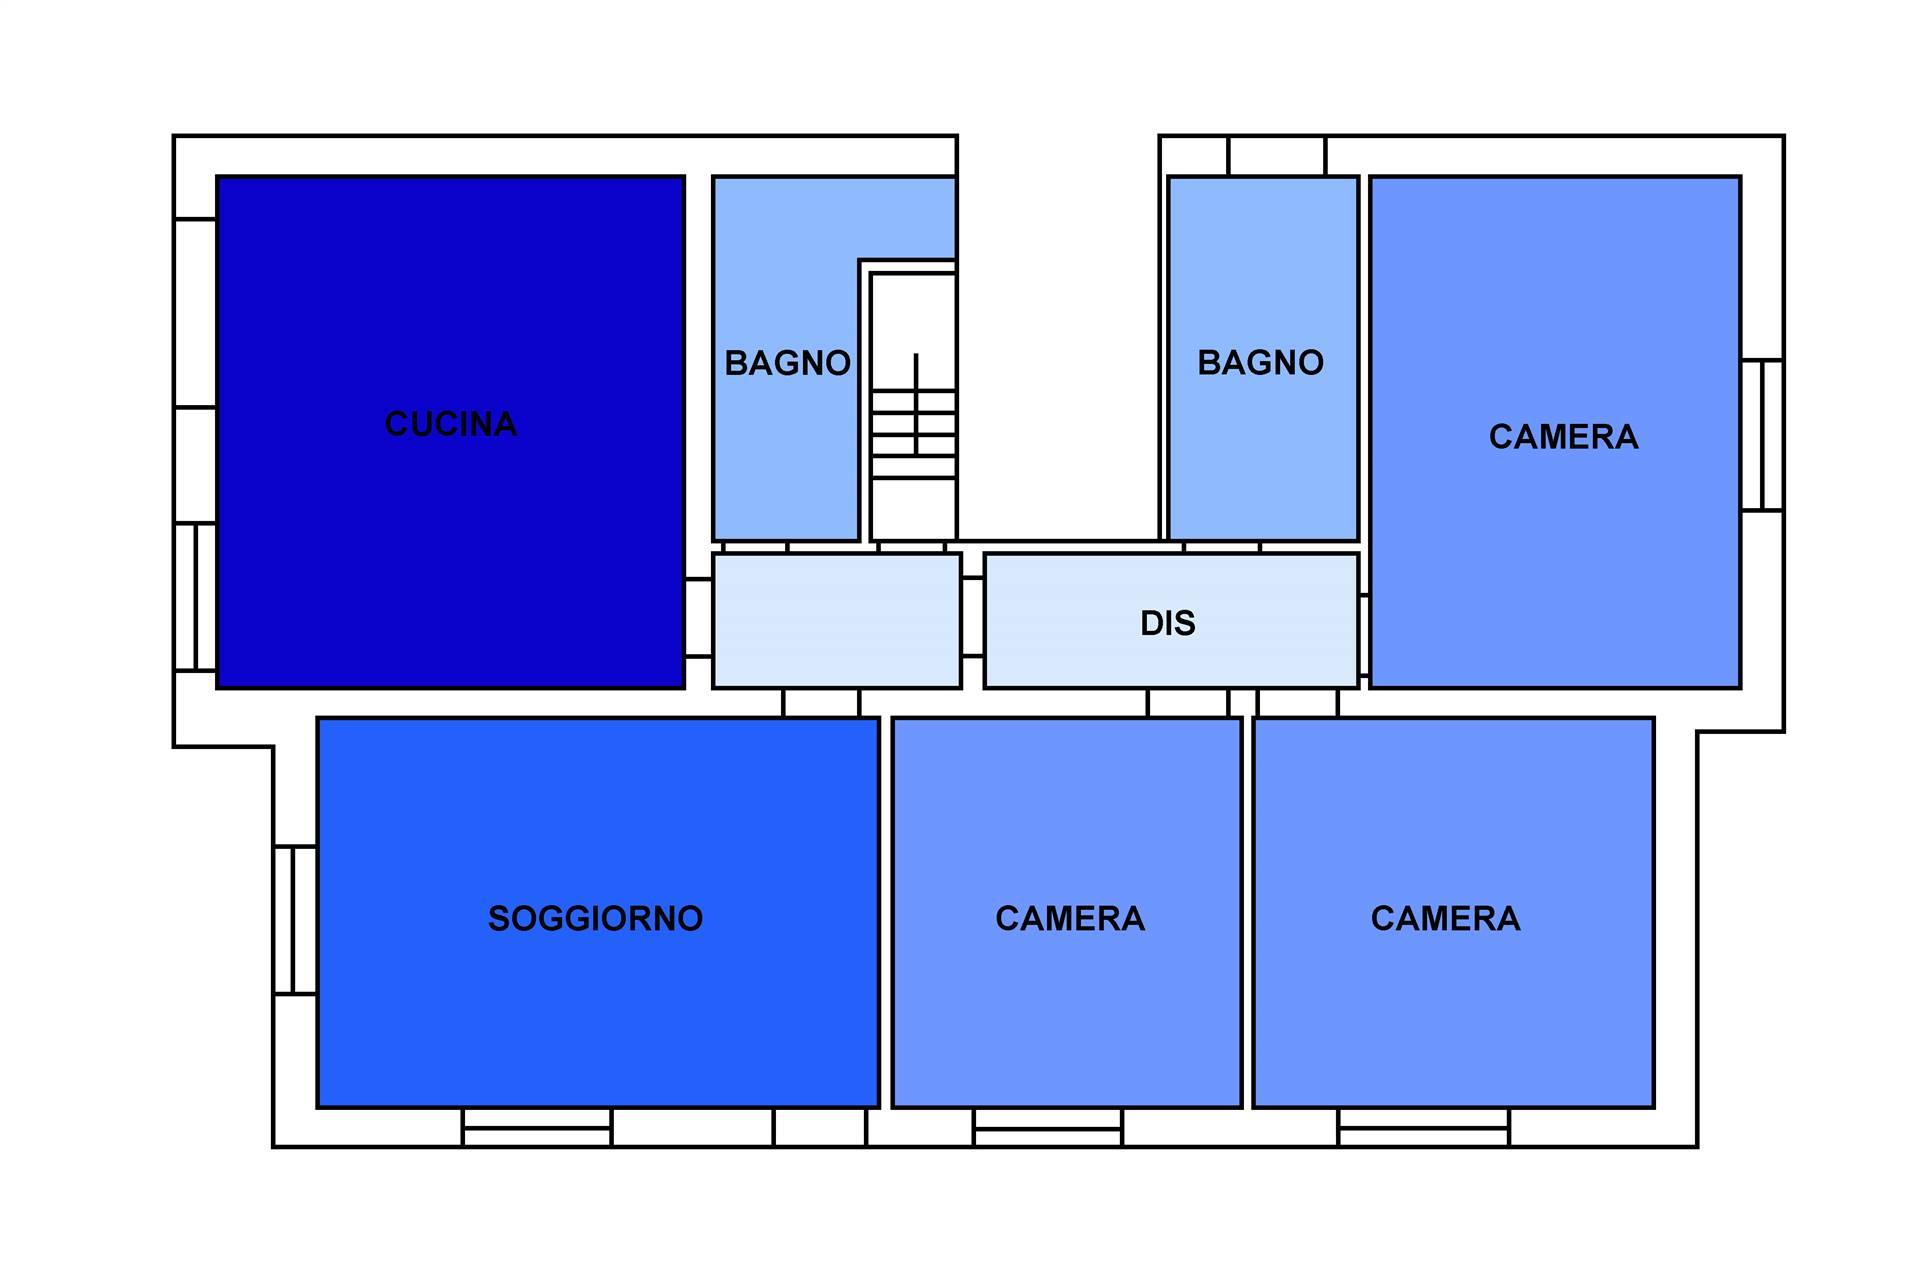 CHIRIGNAGO, VENEZIA, Duplex villa for rent of 150 Sq. mt., Restored, Heating Individual heating system, Energetic class: B, Epi: 73,8 kwh/m2 year,